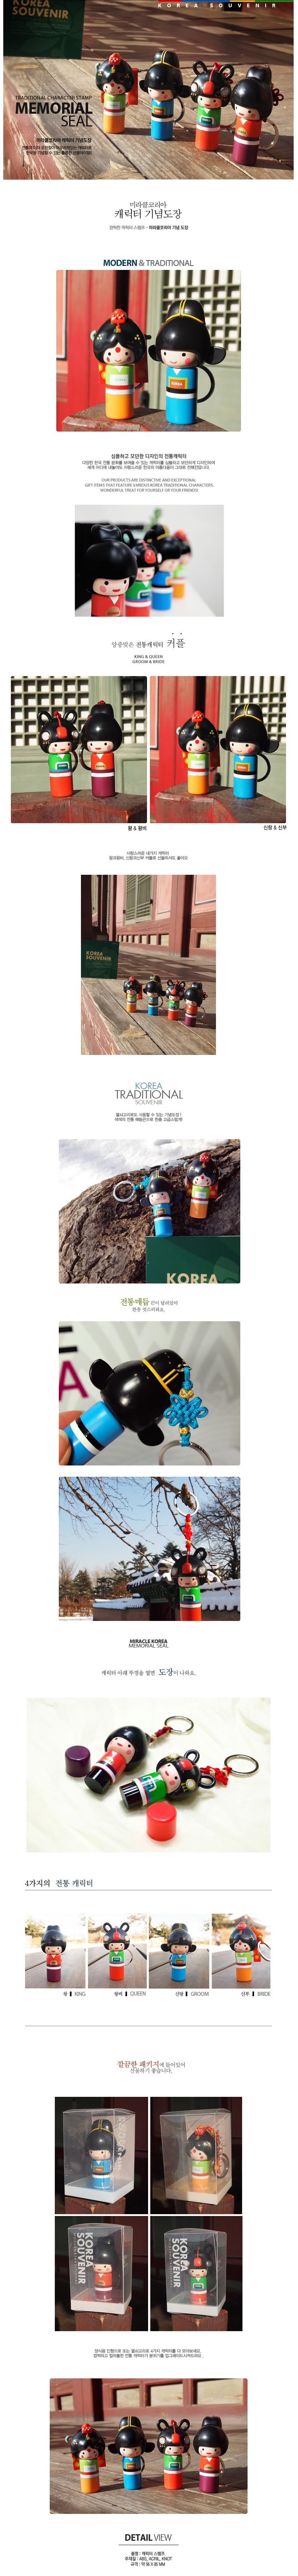 miracle korea-stamp $19 on kstargoods.com